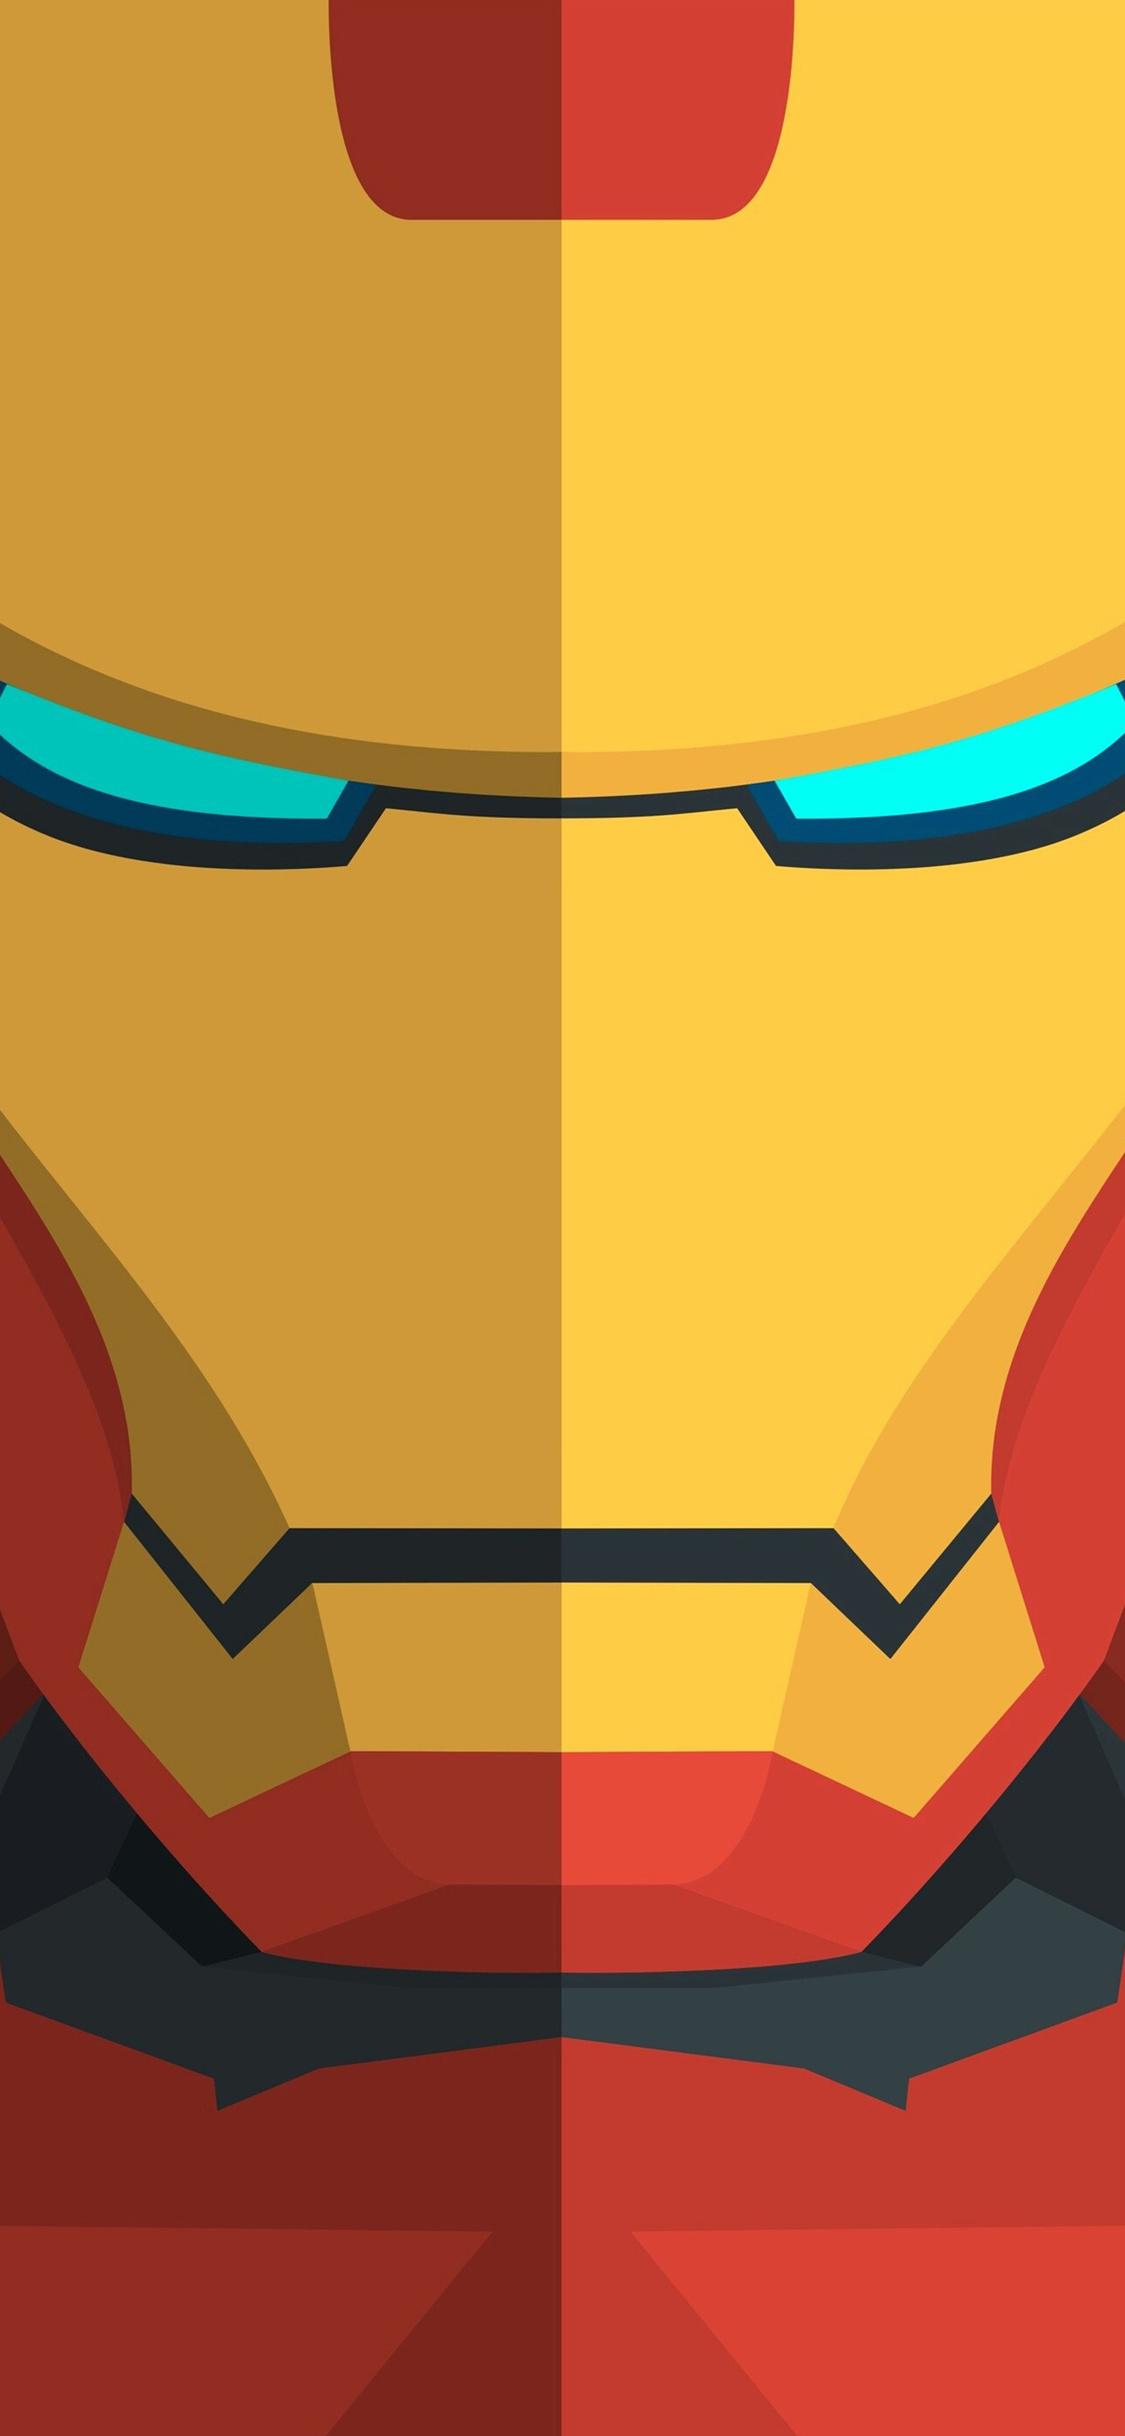 1125x2436 Iron Man Artwork 5k Iphone Xs Iphone 10 Iphone X Hd 4k